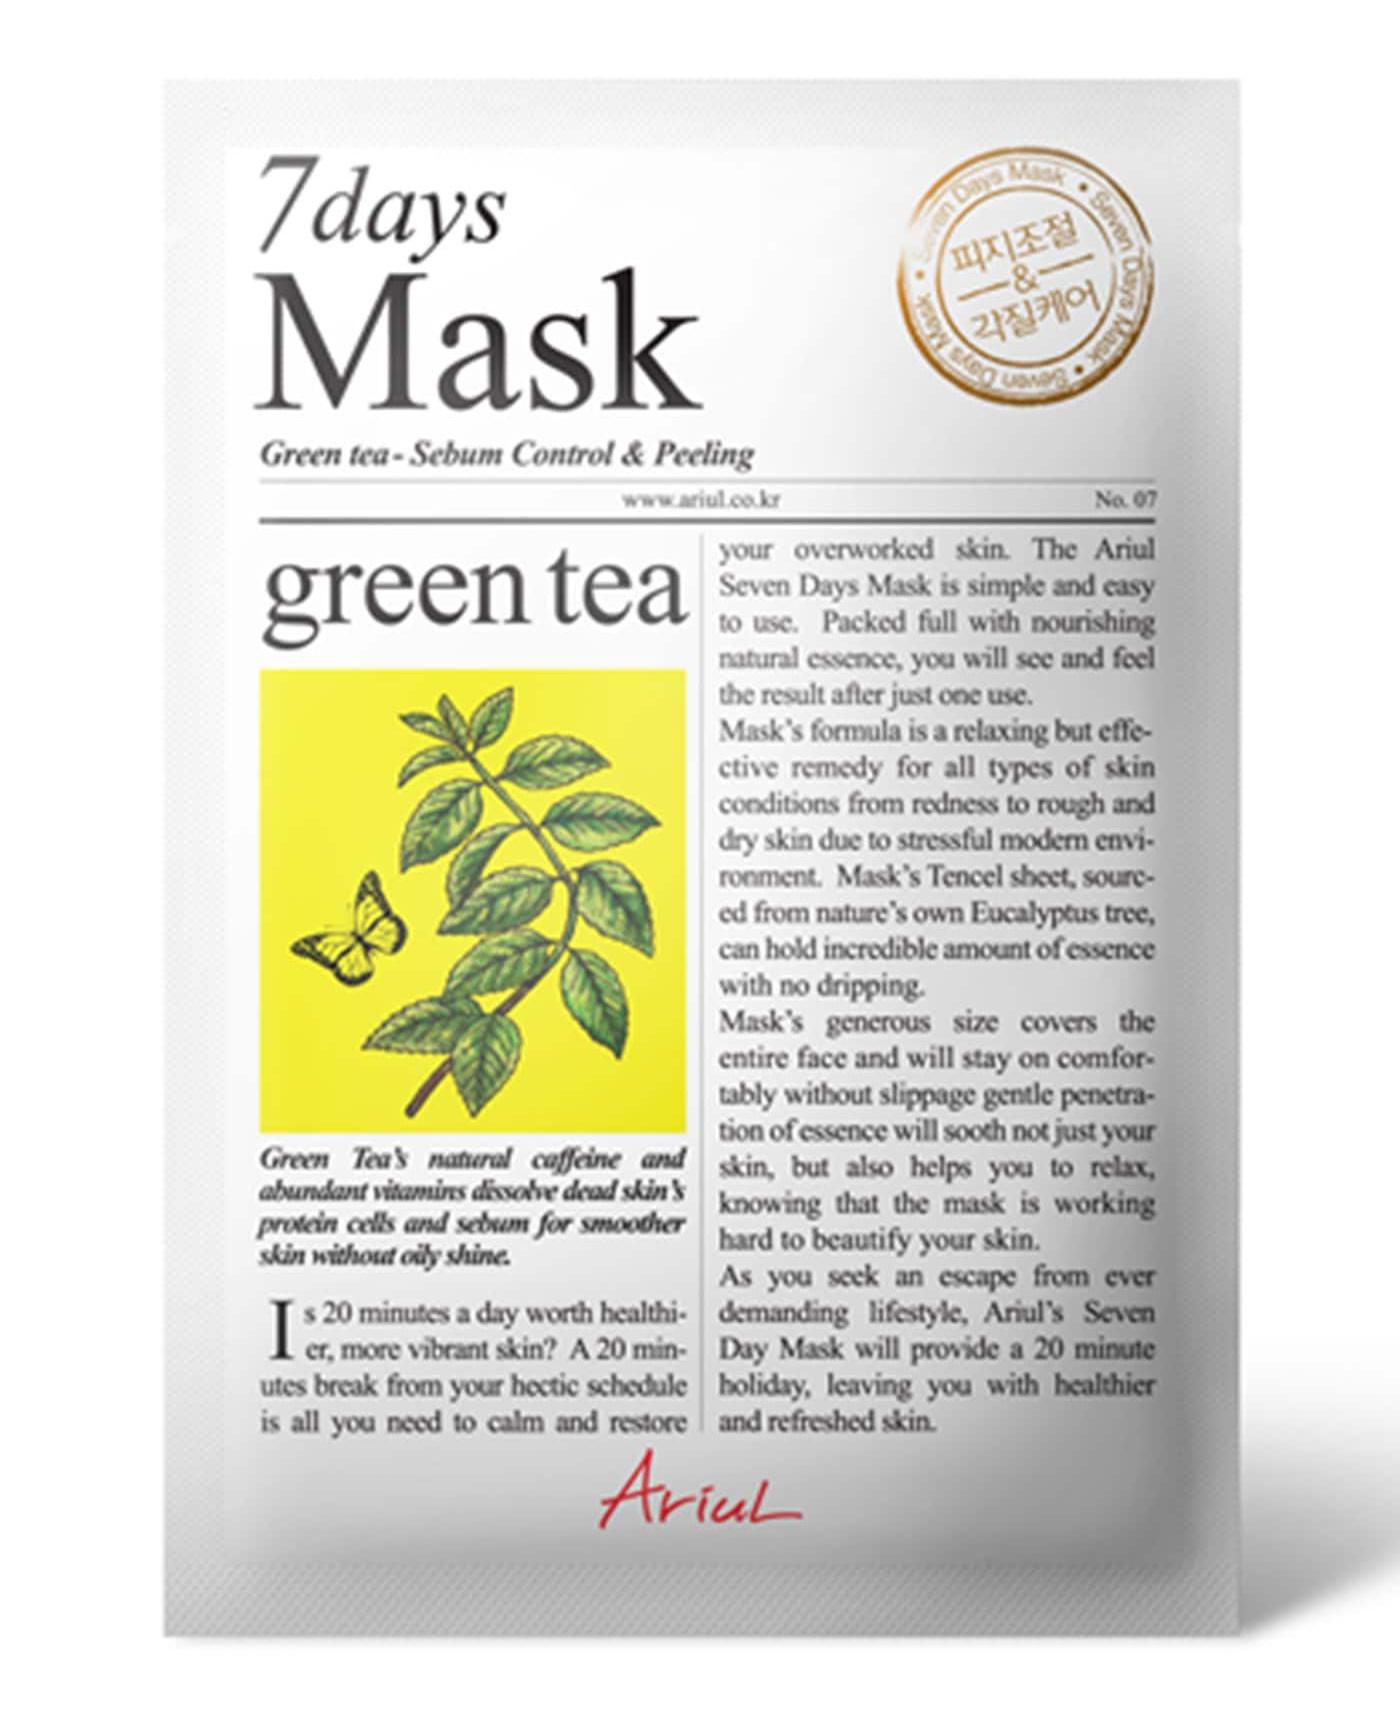 7 days mask Green Tea - Sebum Control & Peeling